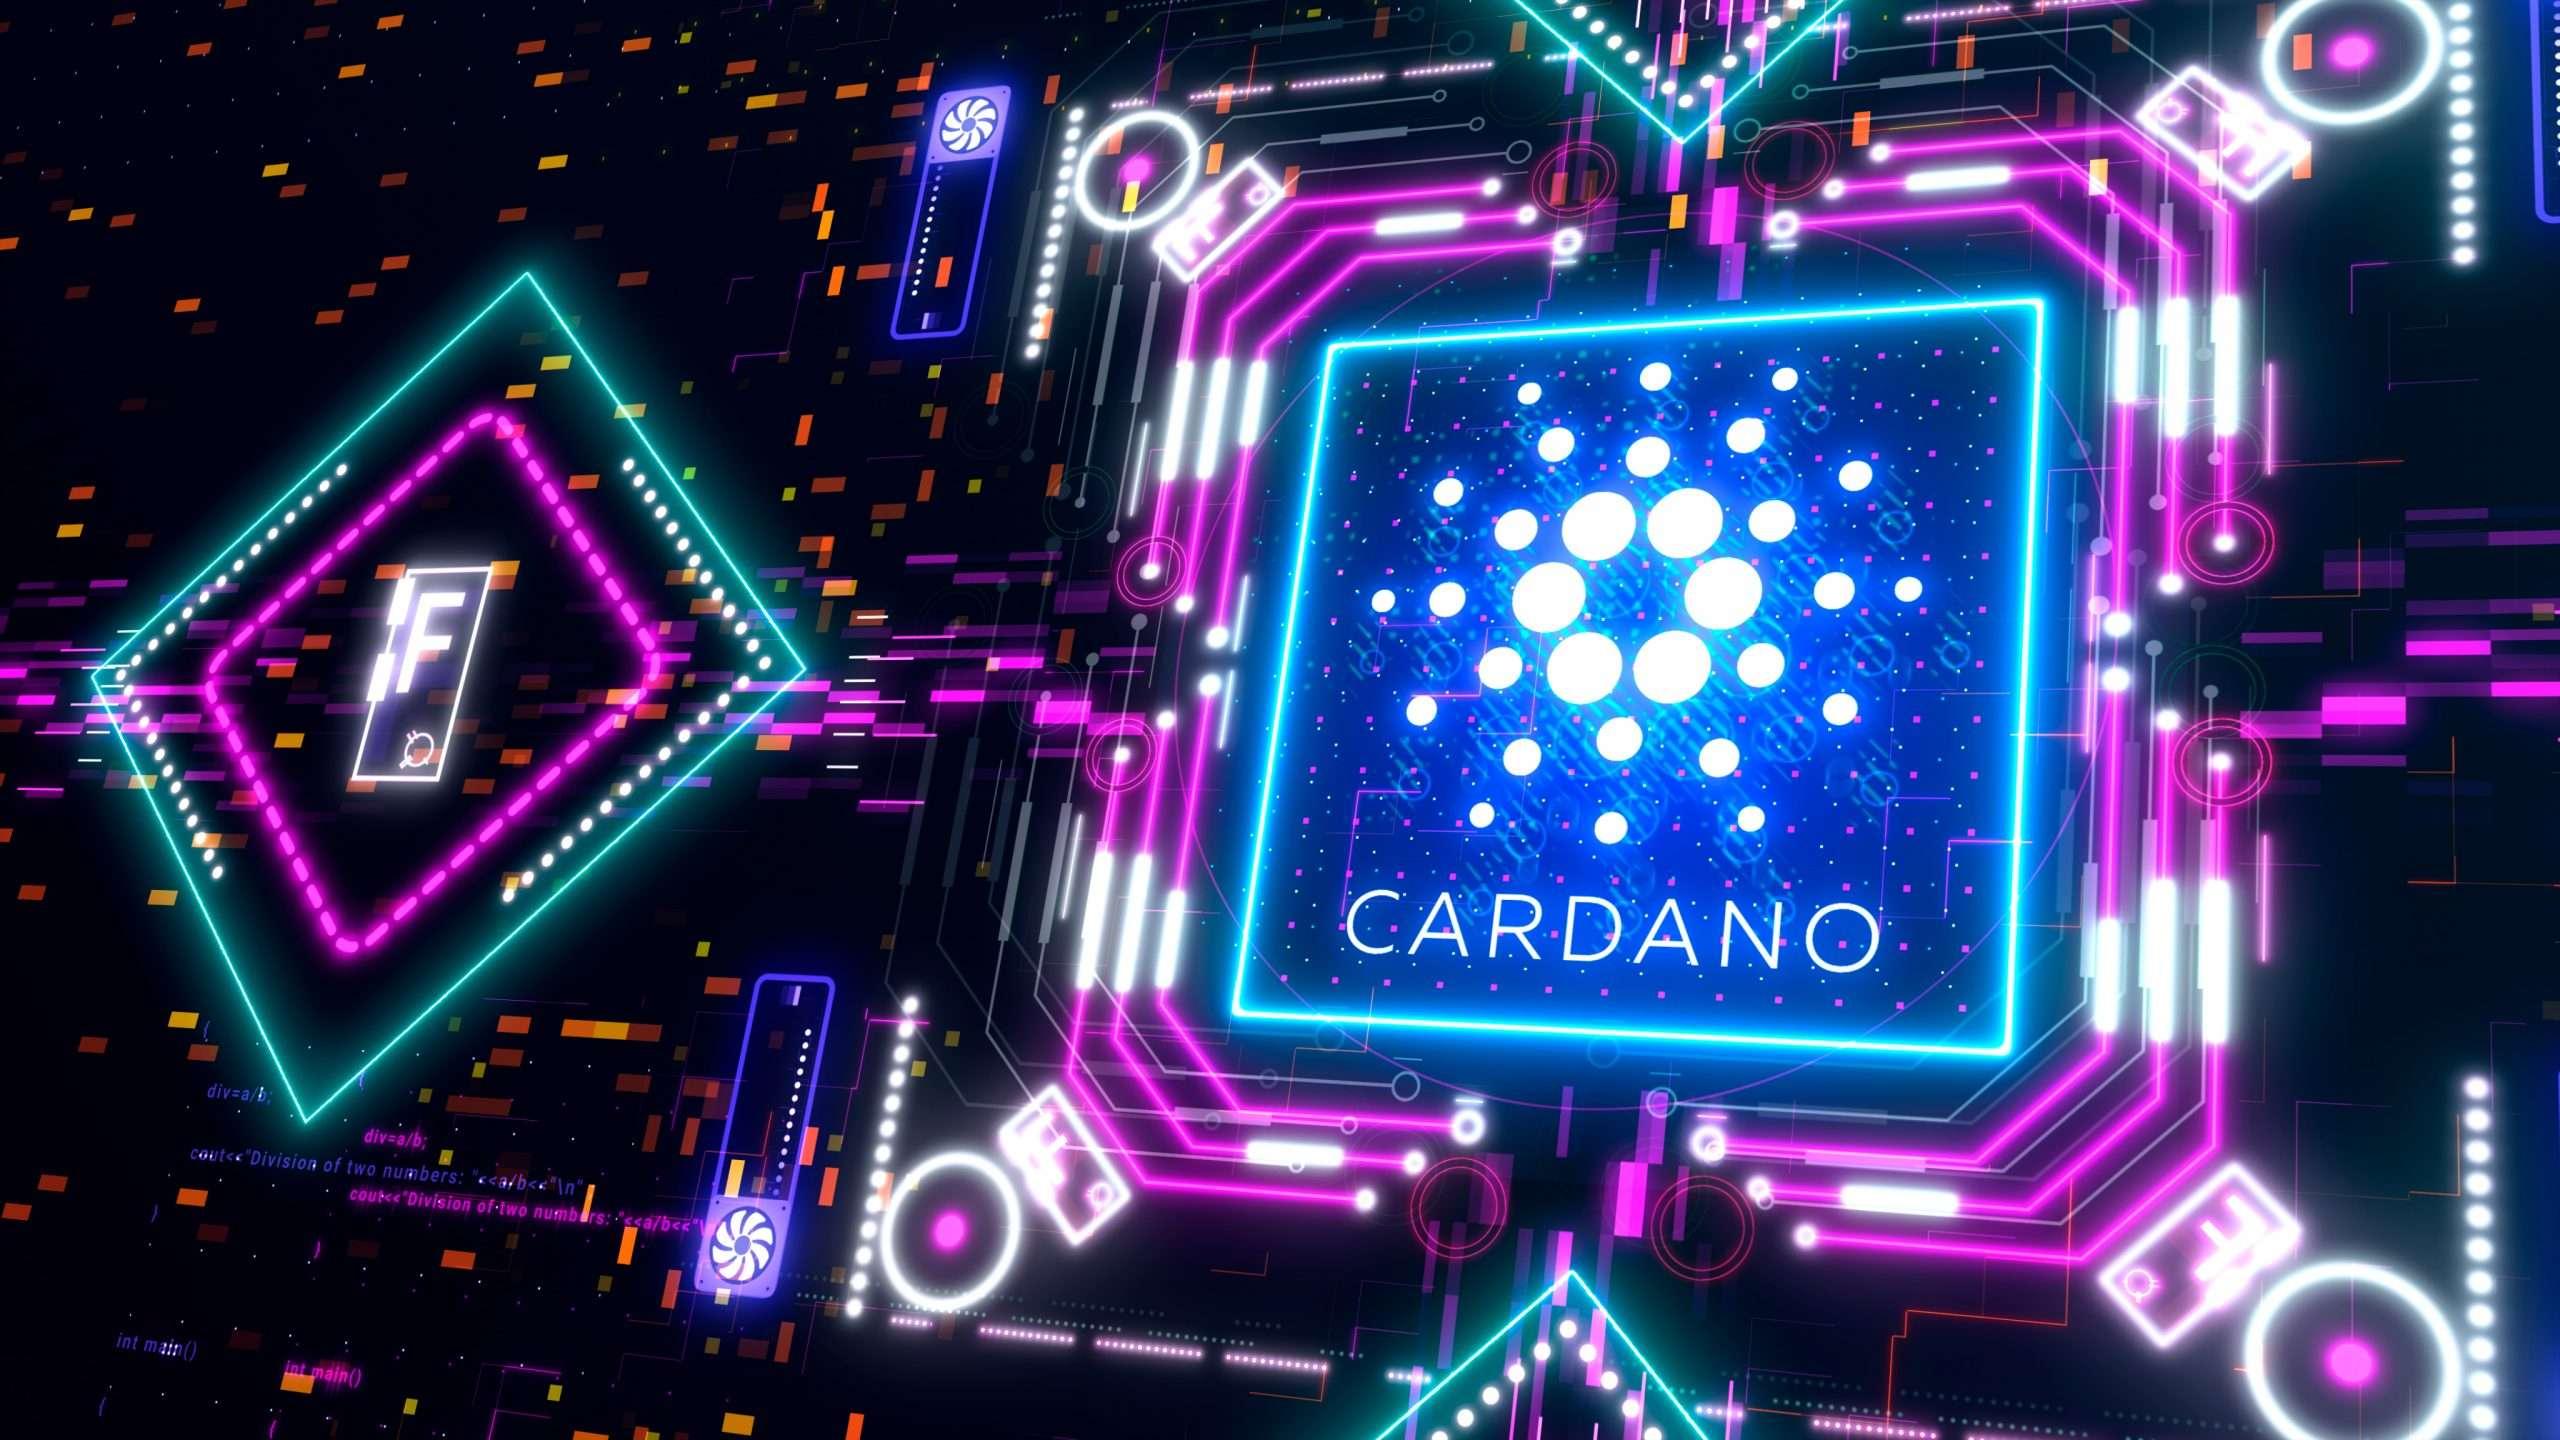 Charles Hoskinson: Cardano will 'kick Ethereum 2.0's ass'